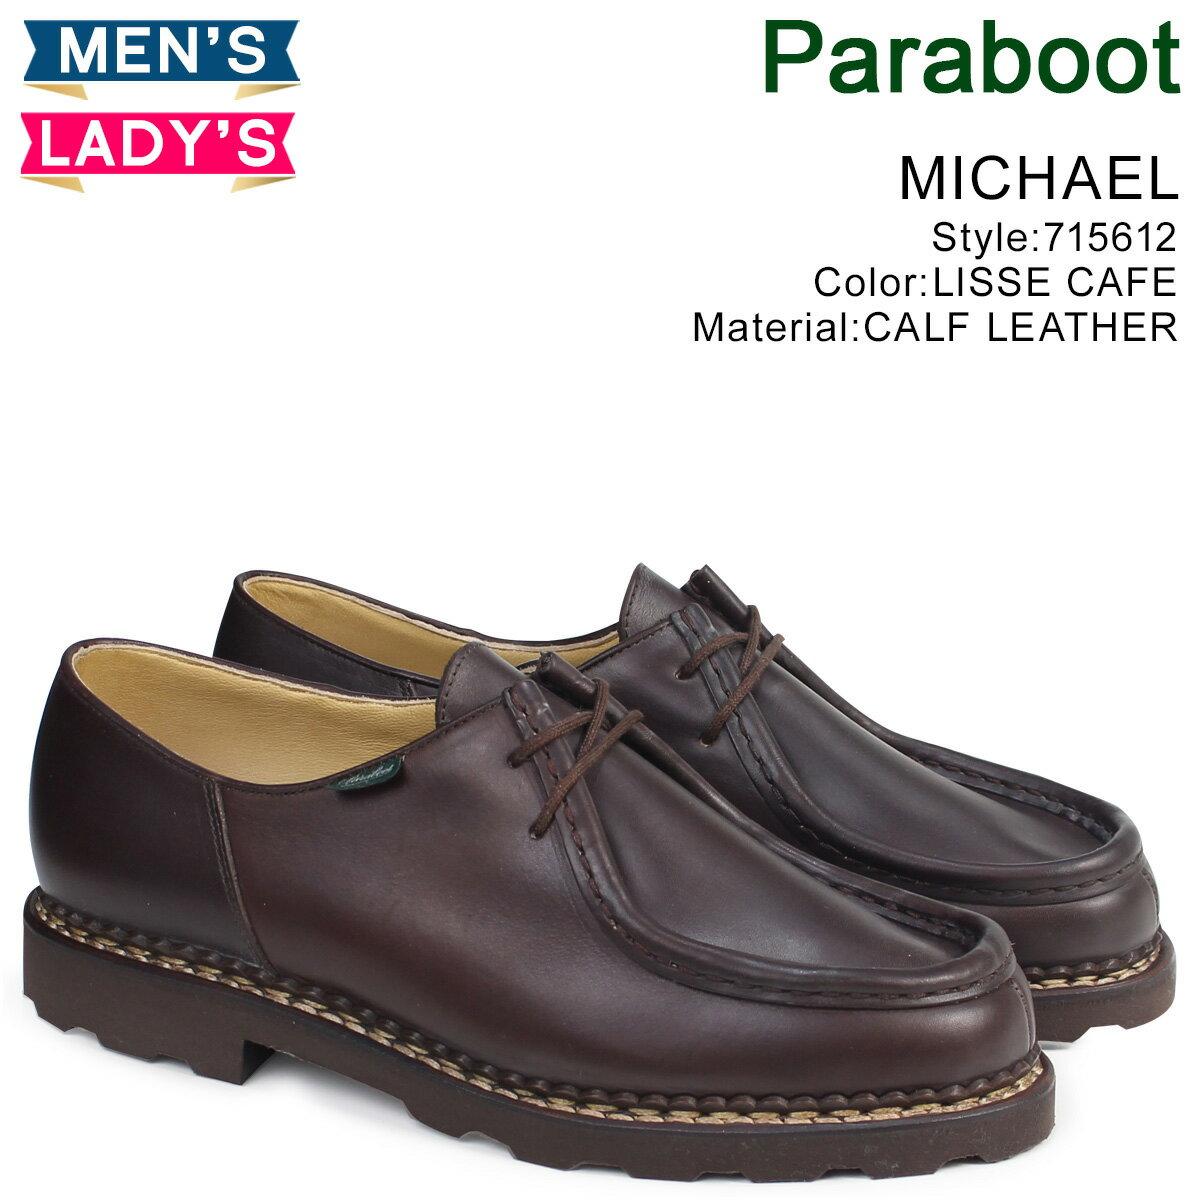 PARABOOT MICHAEL パラブーツ ミカエル シューズ チロリアンシューズ 715612 メンズ レディース 靴 ブラウン [186]